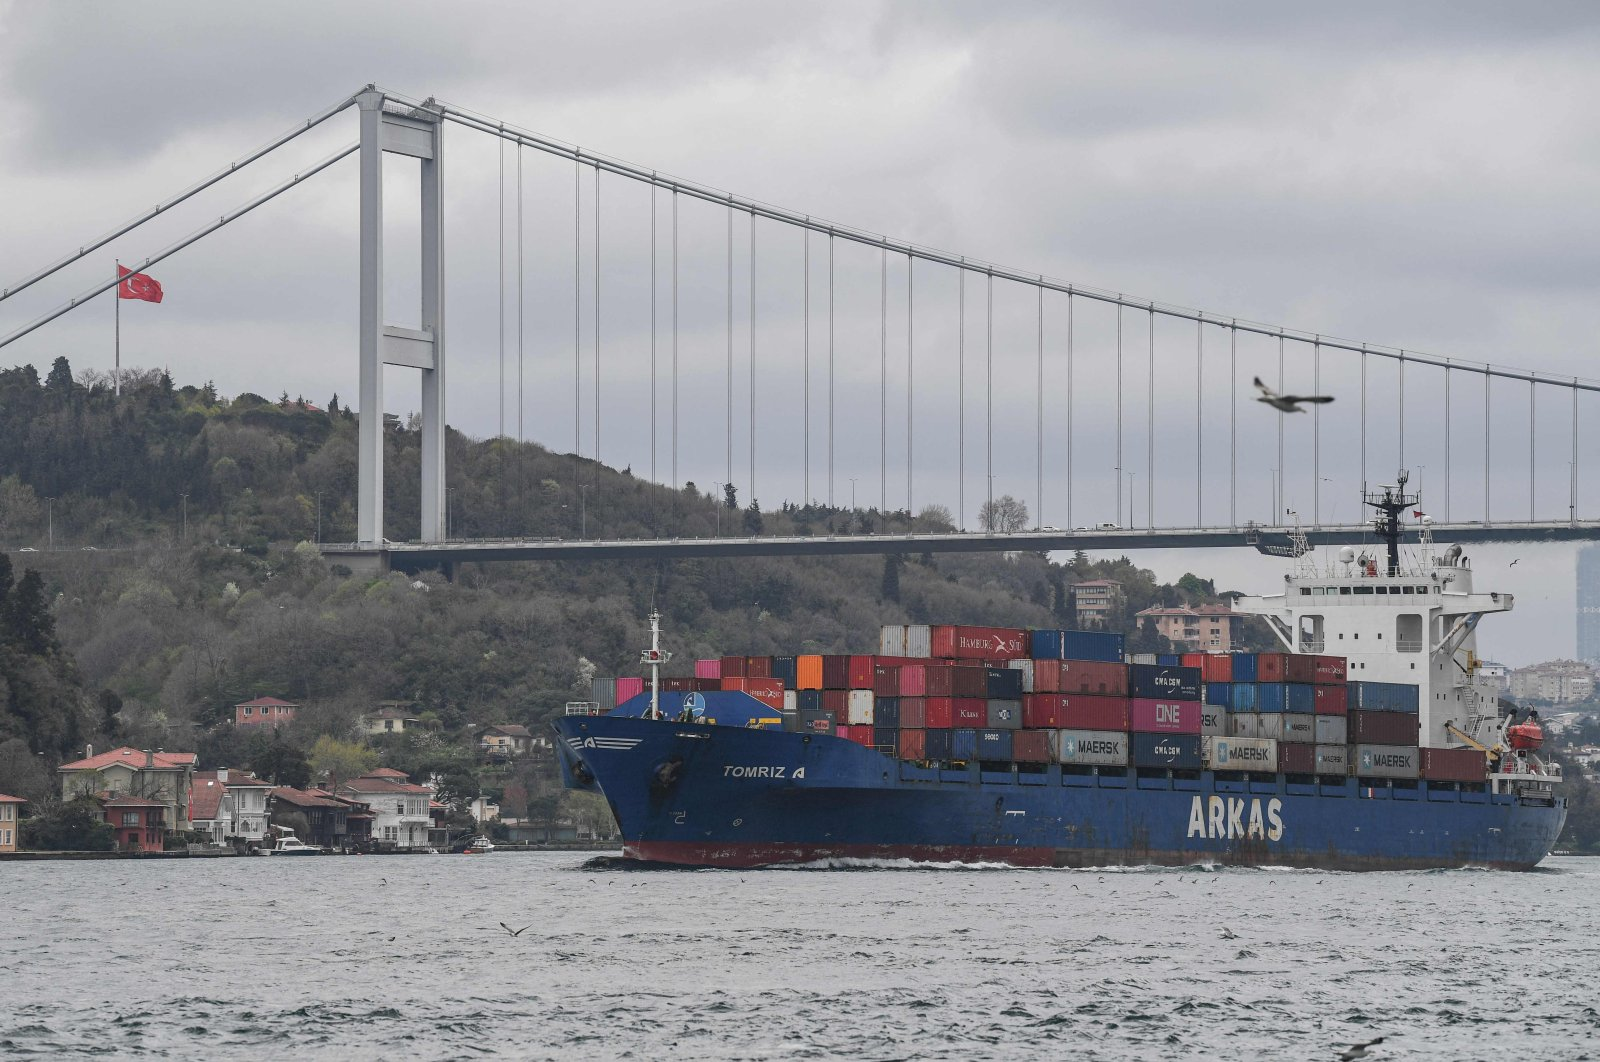 A container ship en route to the Black Sea sails through the Bosporus, Istanbul, Turkey, April 23, 2021. (AFP Photo)